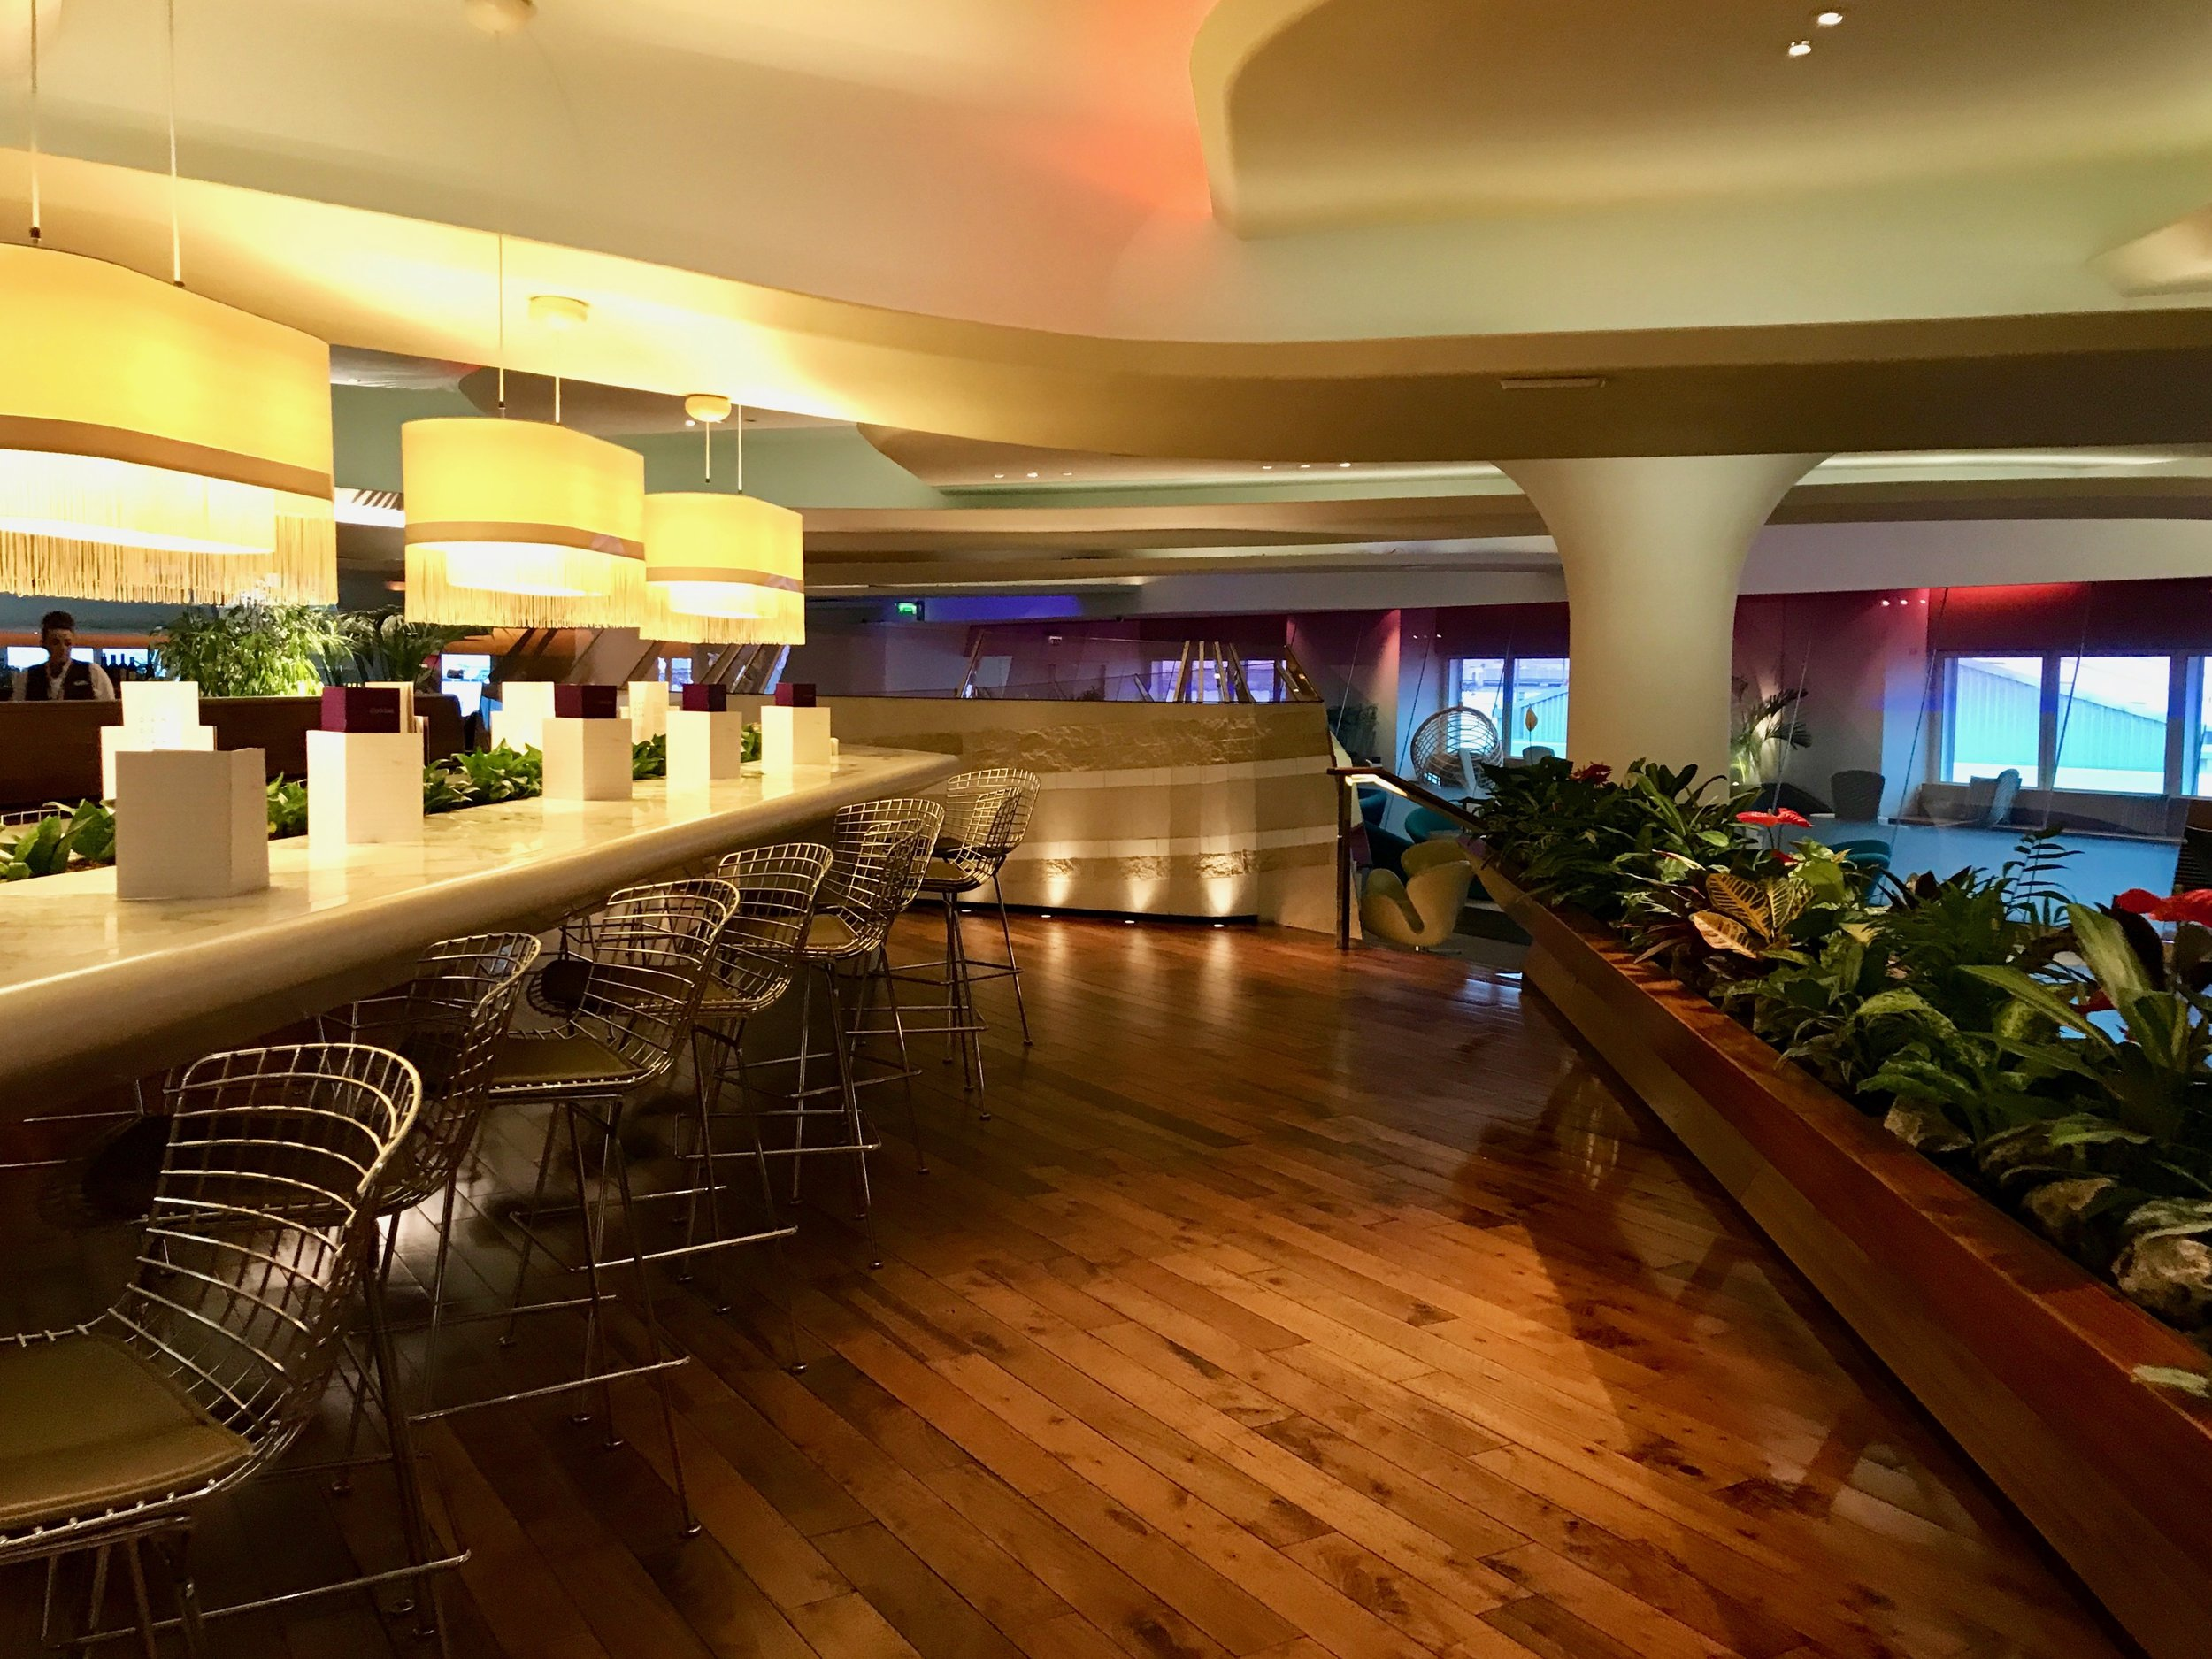 Virgin Atlantic Clubhouse Lounge London Heathrow LHR Airport - 4.jpg